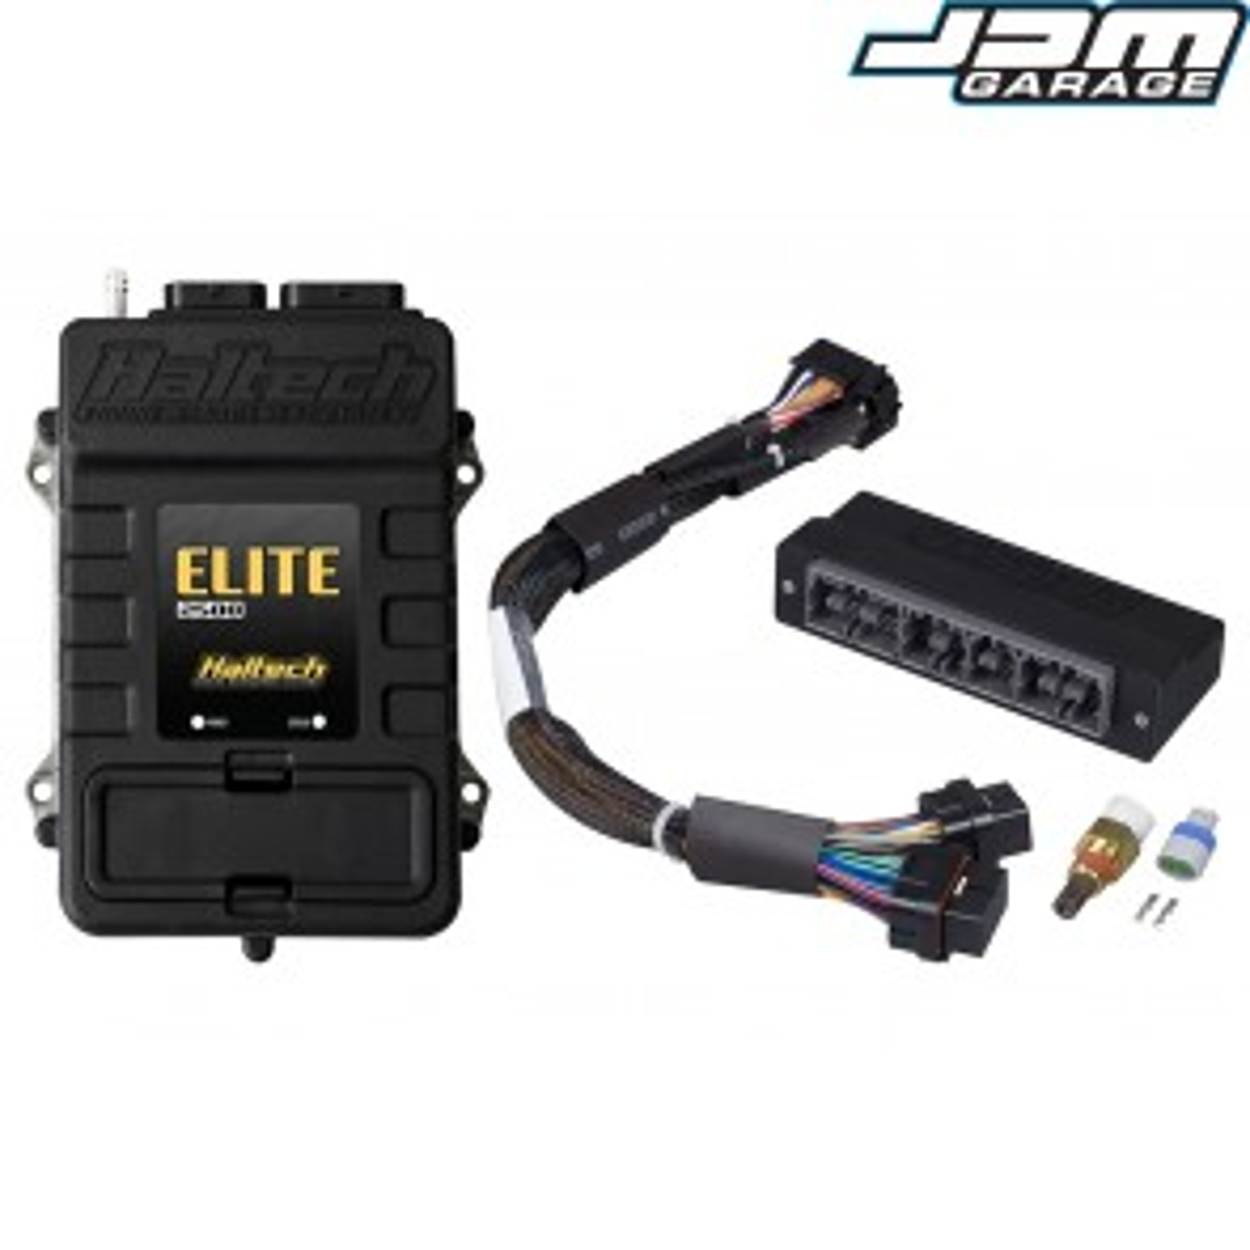 Haltech Elite 2500+ ECU Subaru WRX MY06-07 With Plug 'n' Play Adaptor Harness Kit